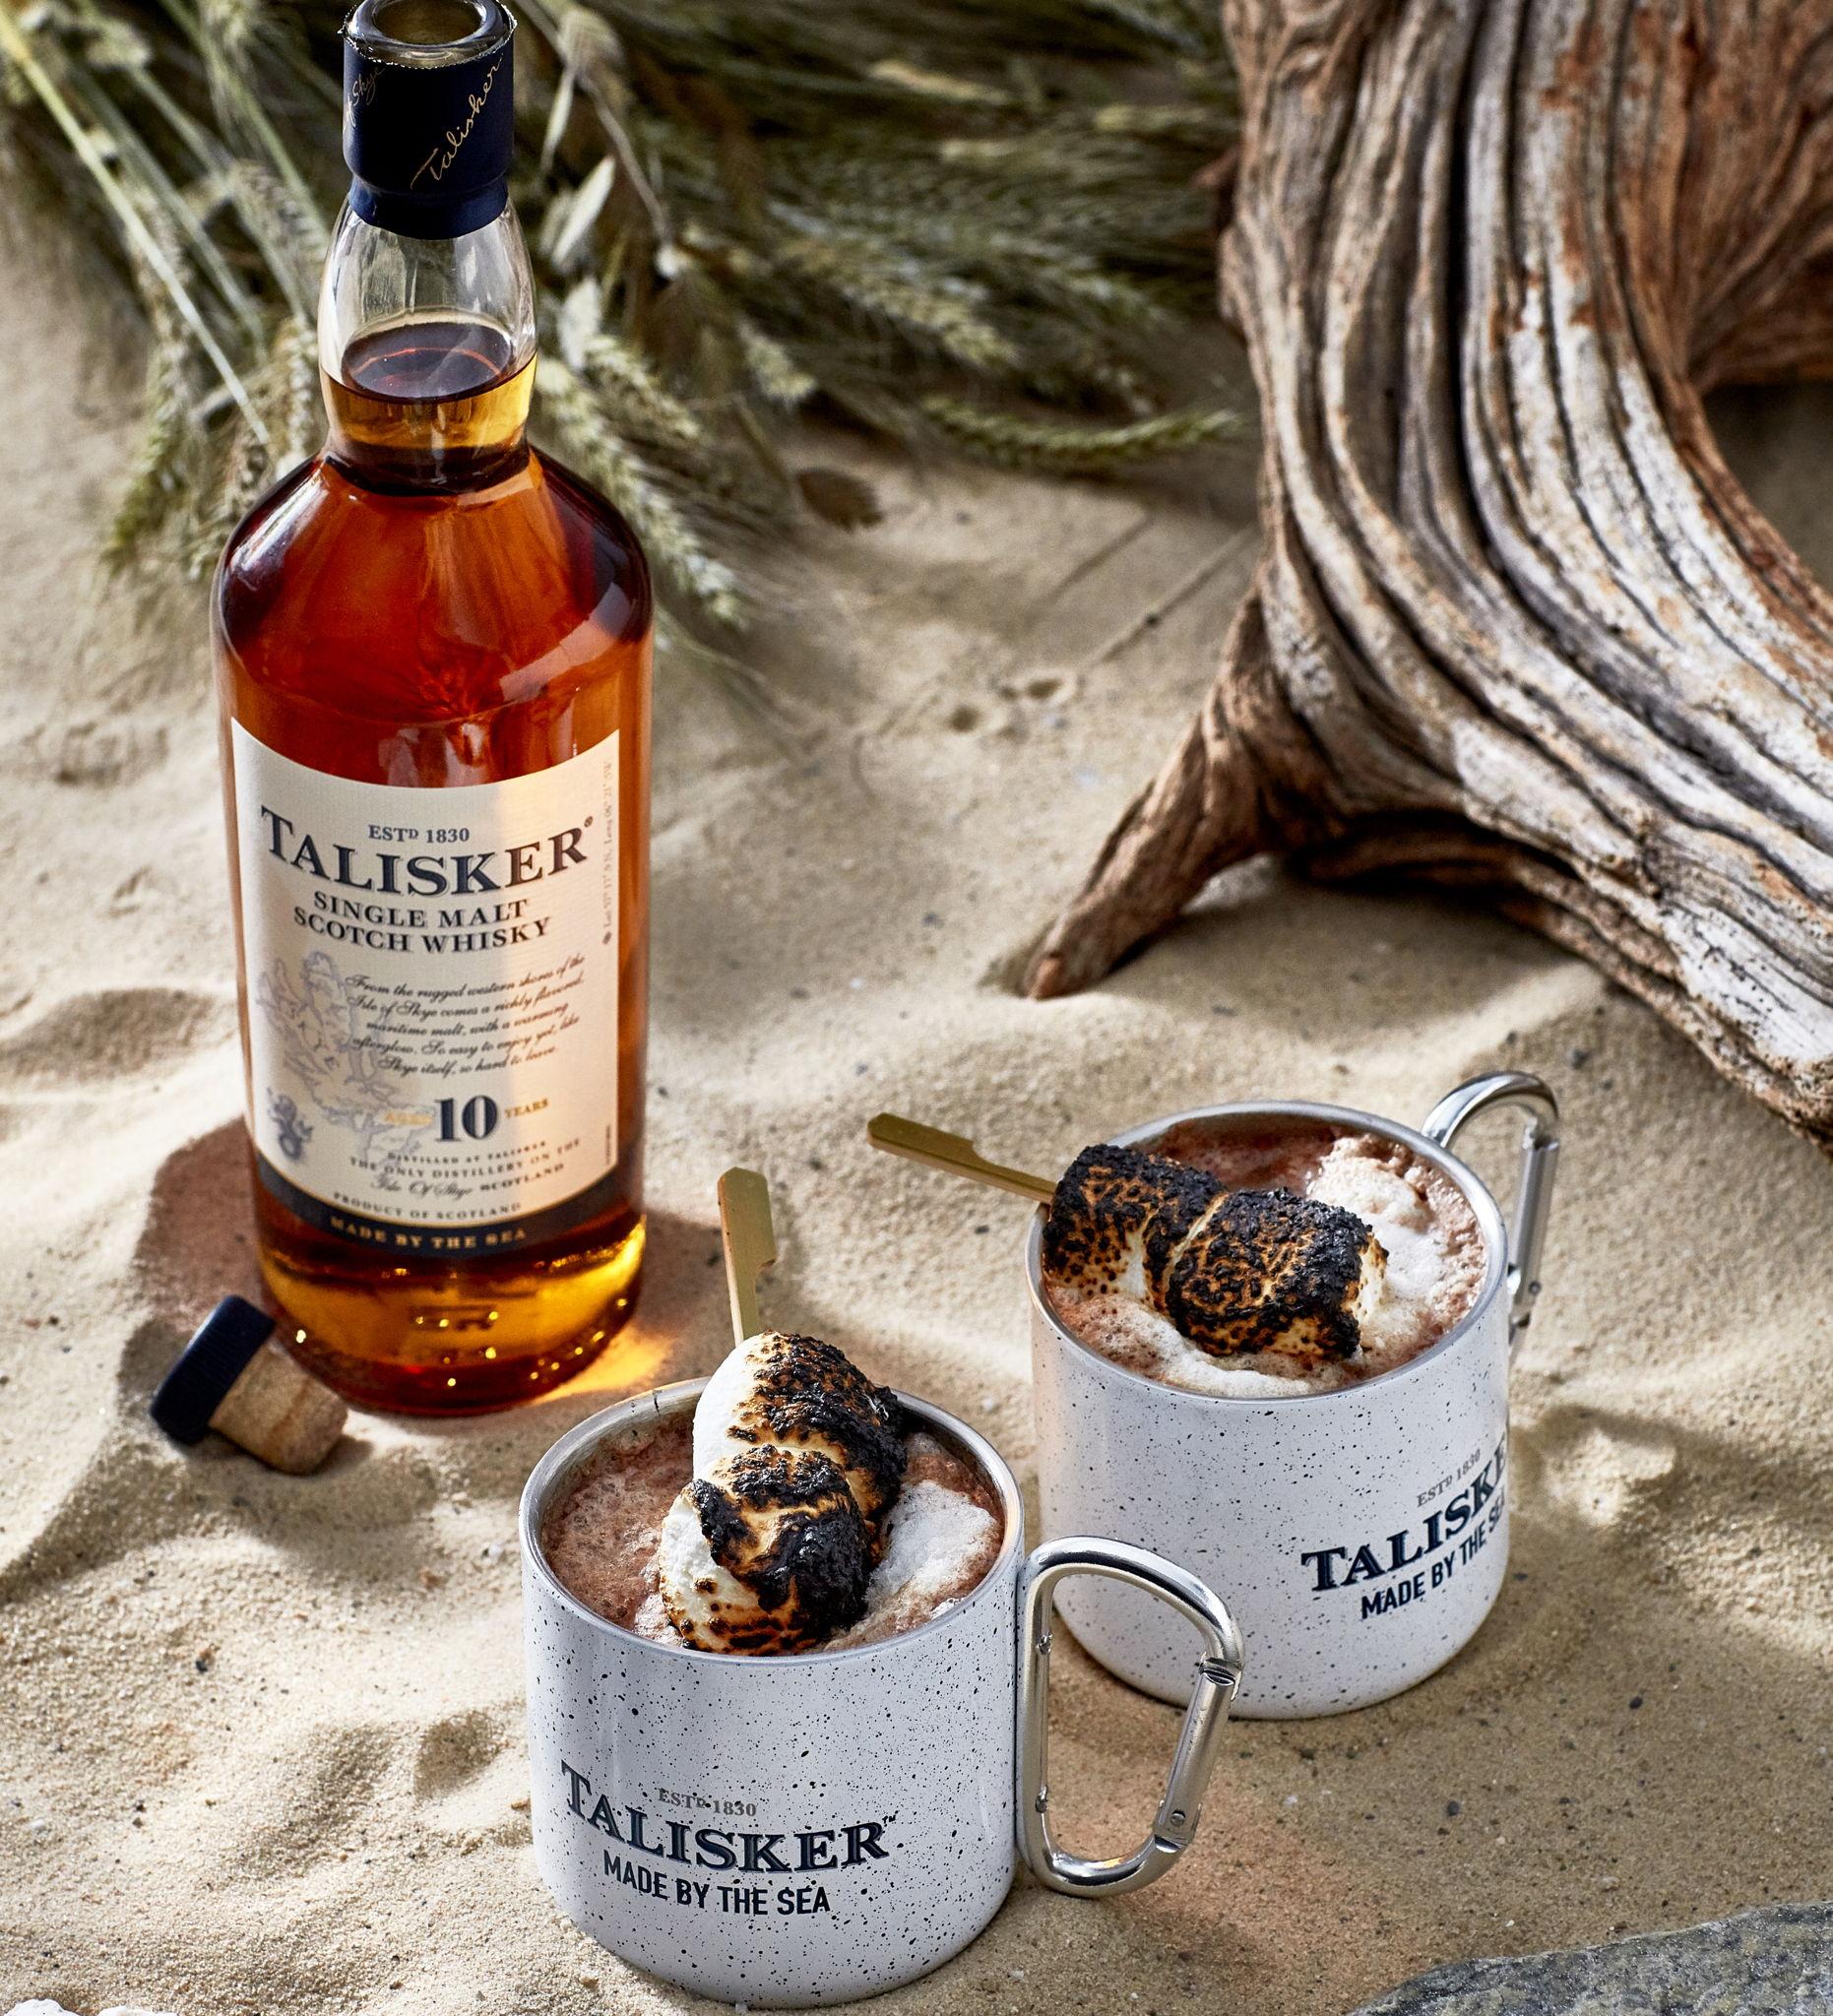 Talisker made by the sea- recepten met whiskey - Taliskey 10 year old - talisker destillery - goede whiskey - Talisker, de enige Single Malt whisky van het eiland Skye: een warm welkom van een wilde zee